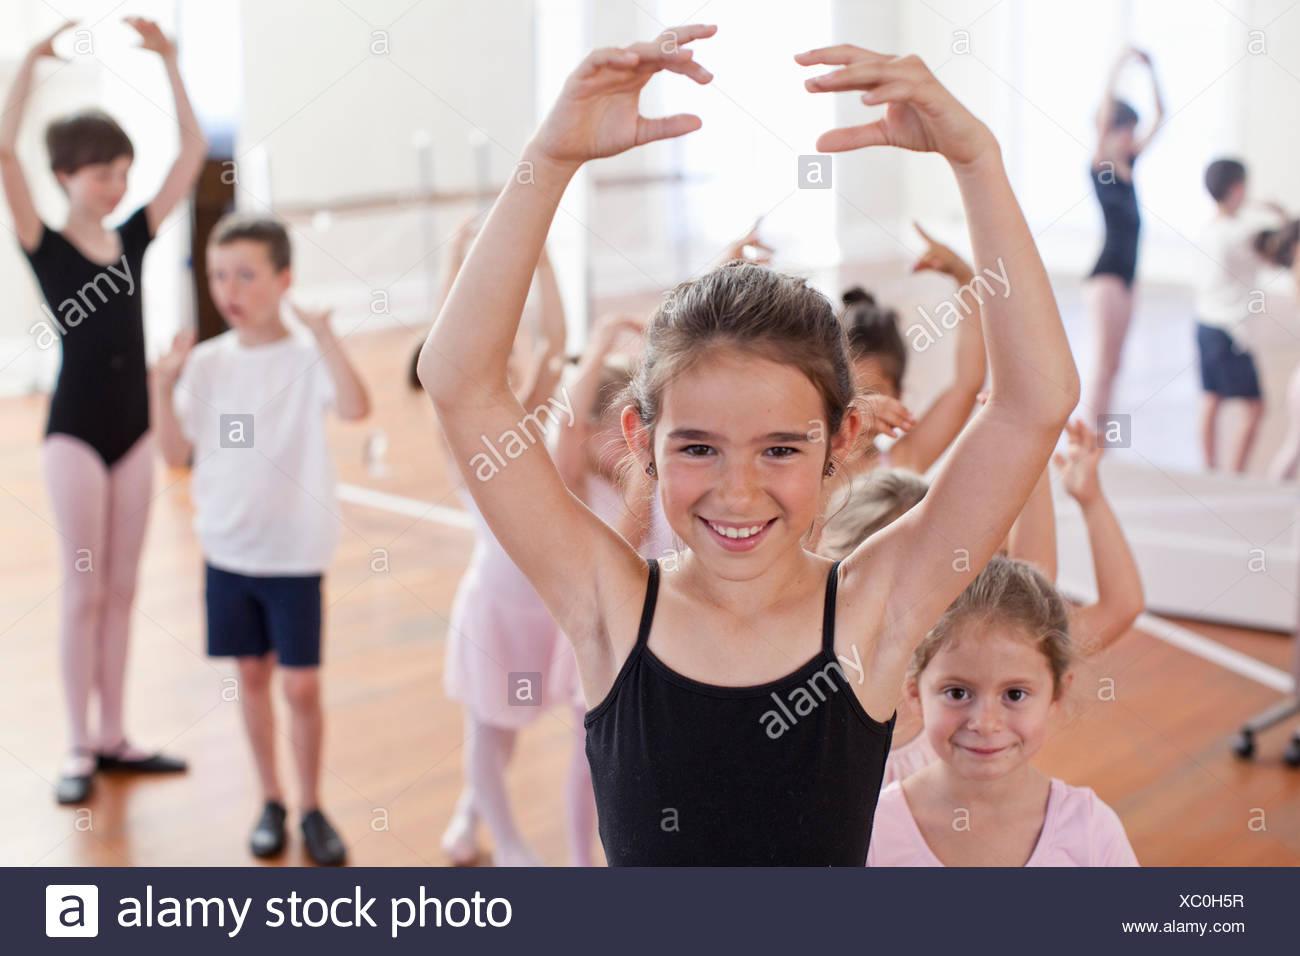 Retrato de chica bailando ballet escuela de ballet Imagen De Stock